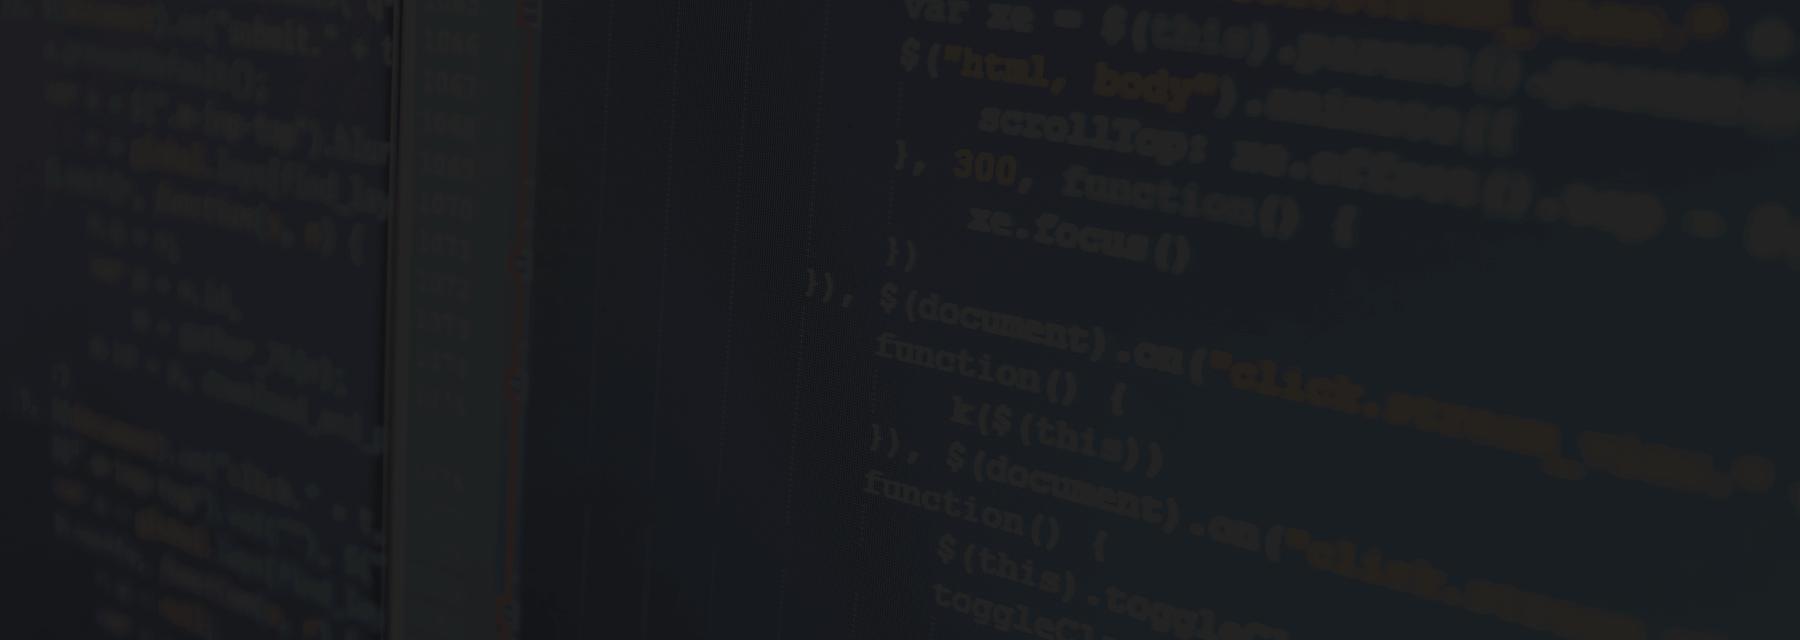 Node.js Development Company and Node js consulting Services